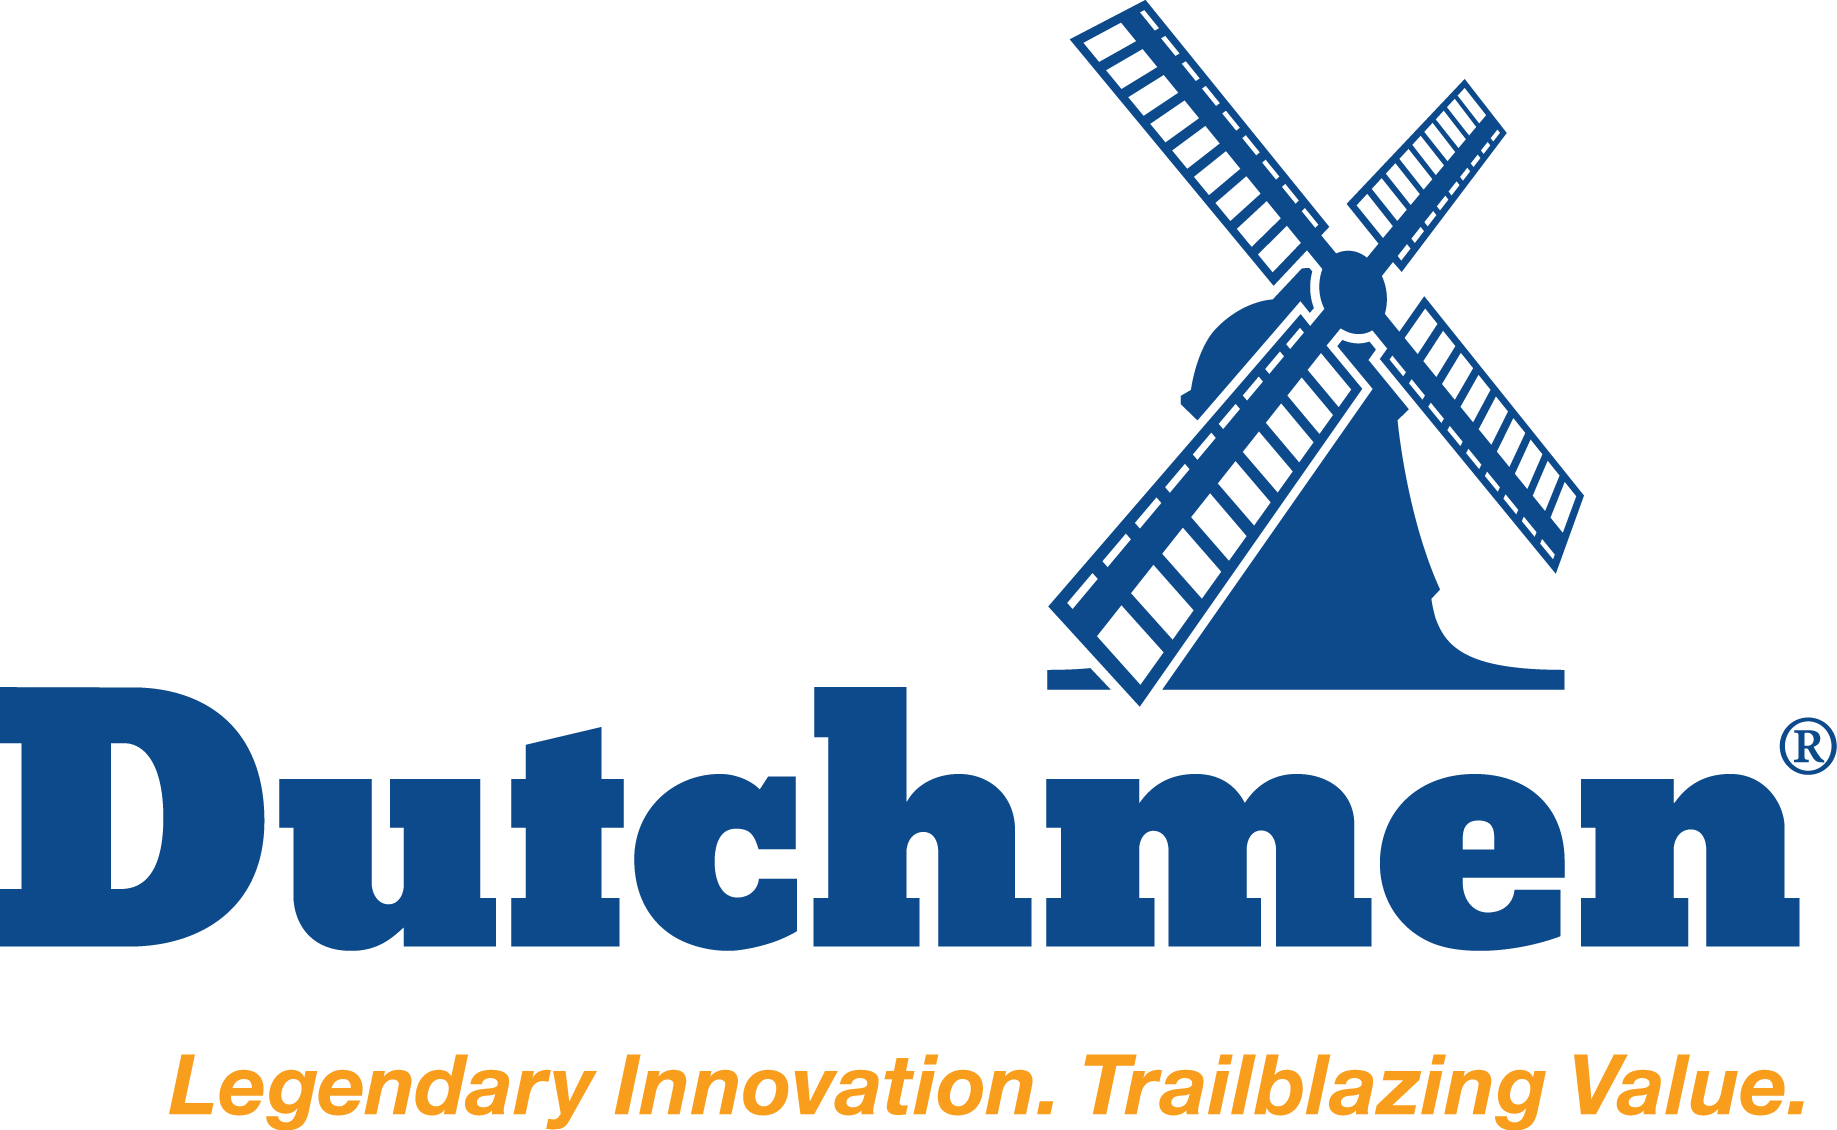 Dutchmen RV